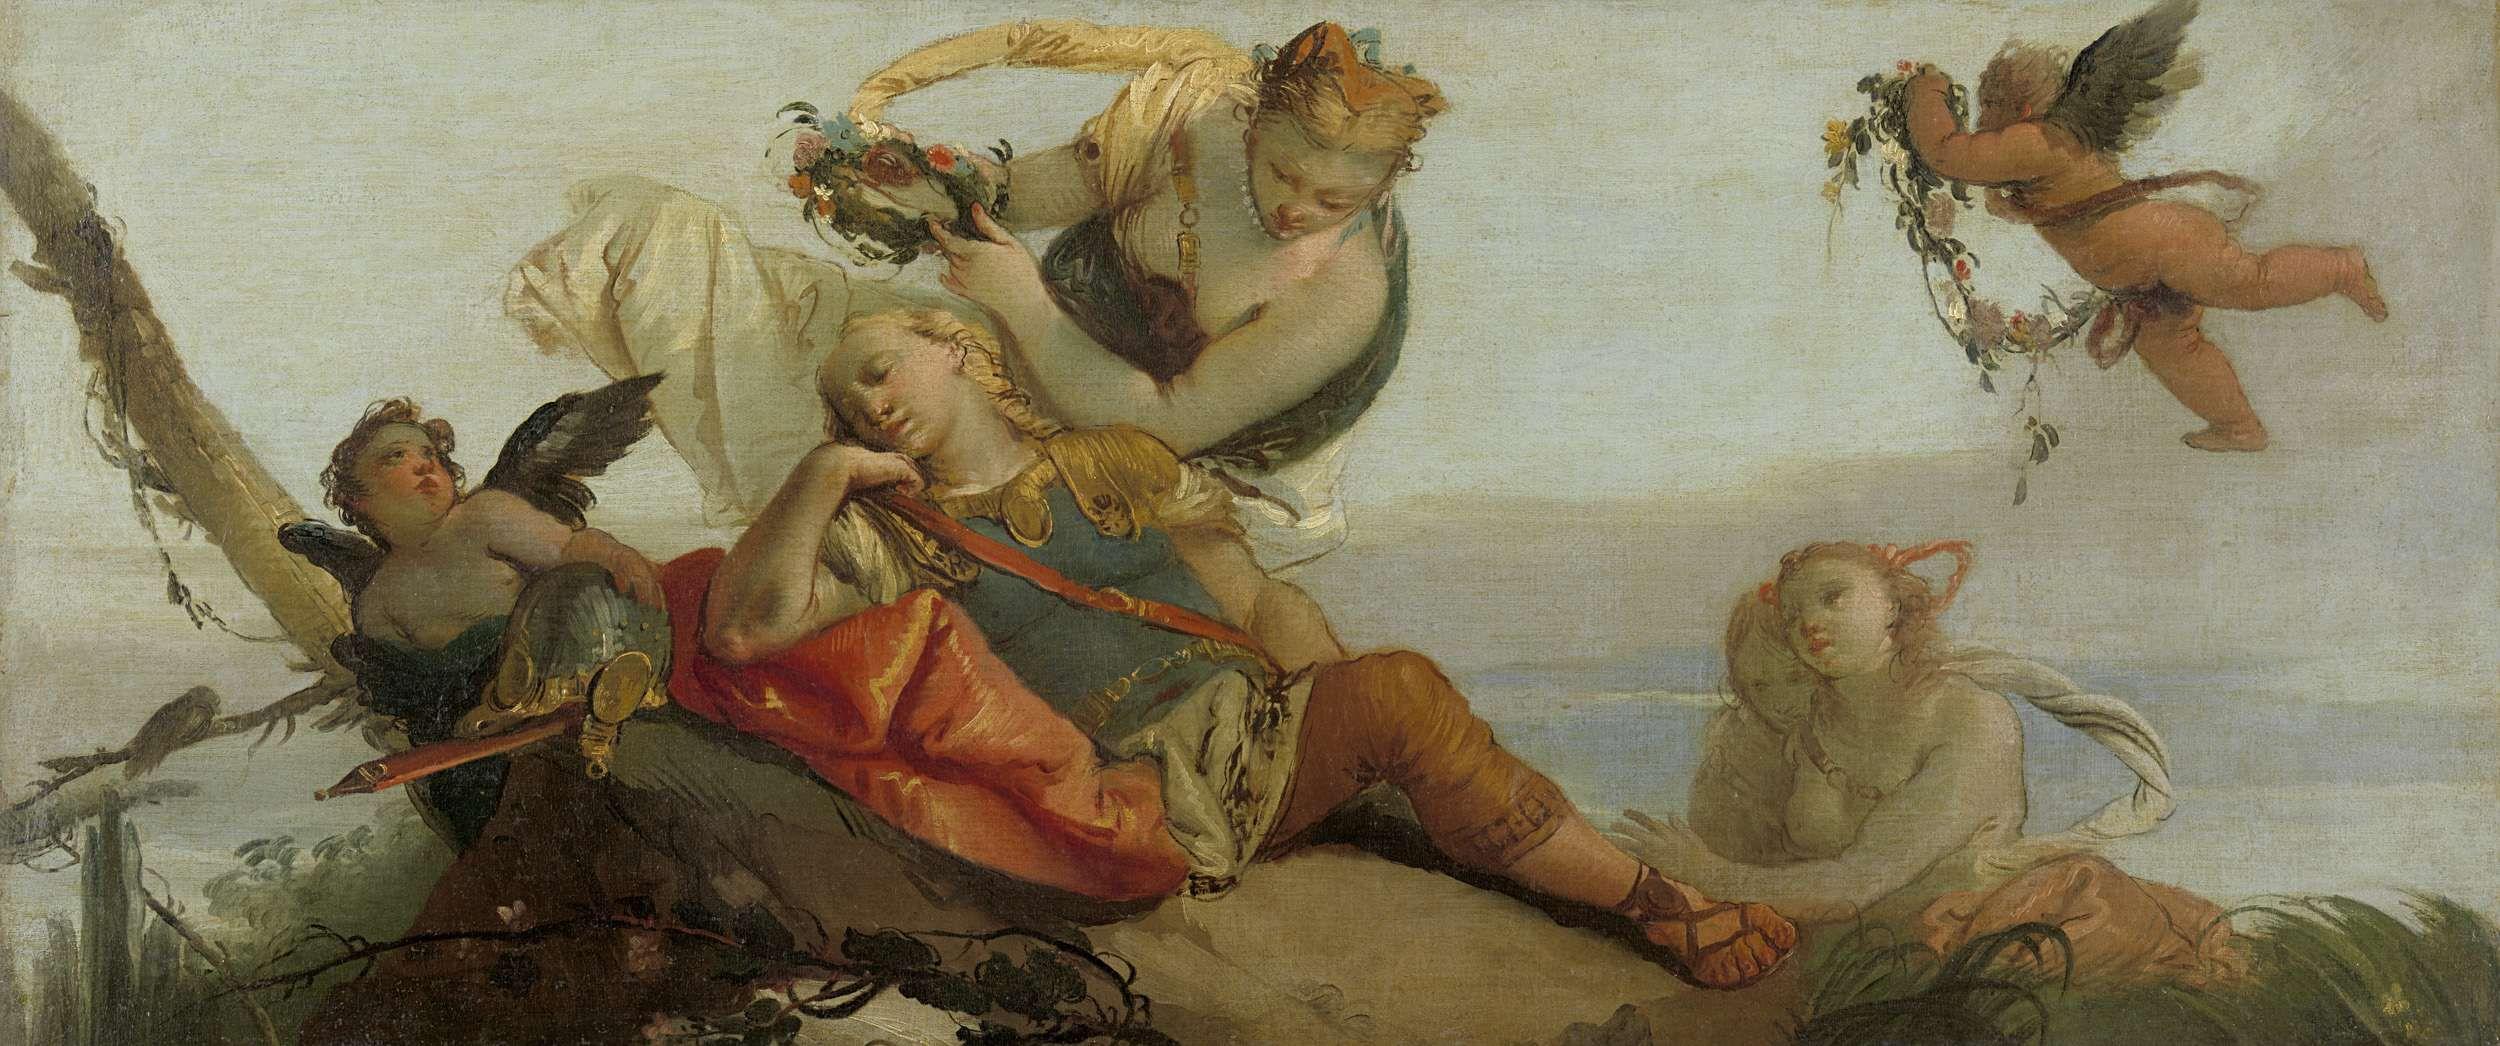 The Sleeping Rinaldo Crowned with Flowers by Armida (formerly entitled Sleeping Mars), Francesco Zugno, 1750 - 1780